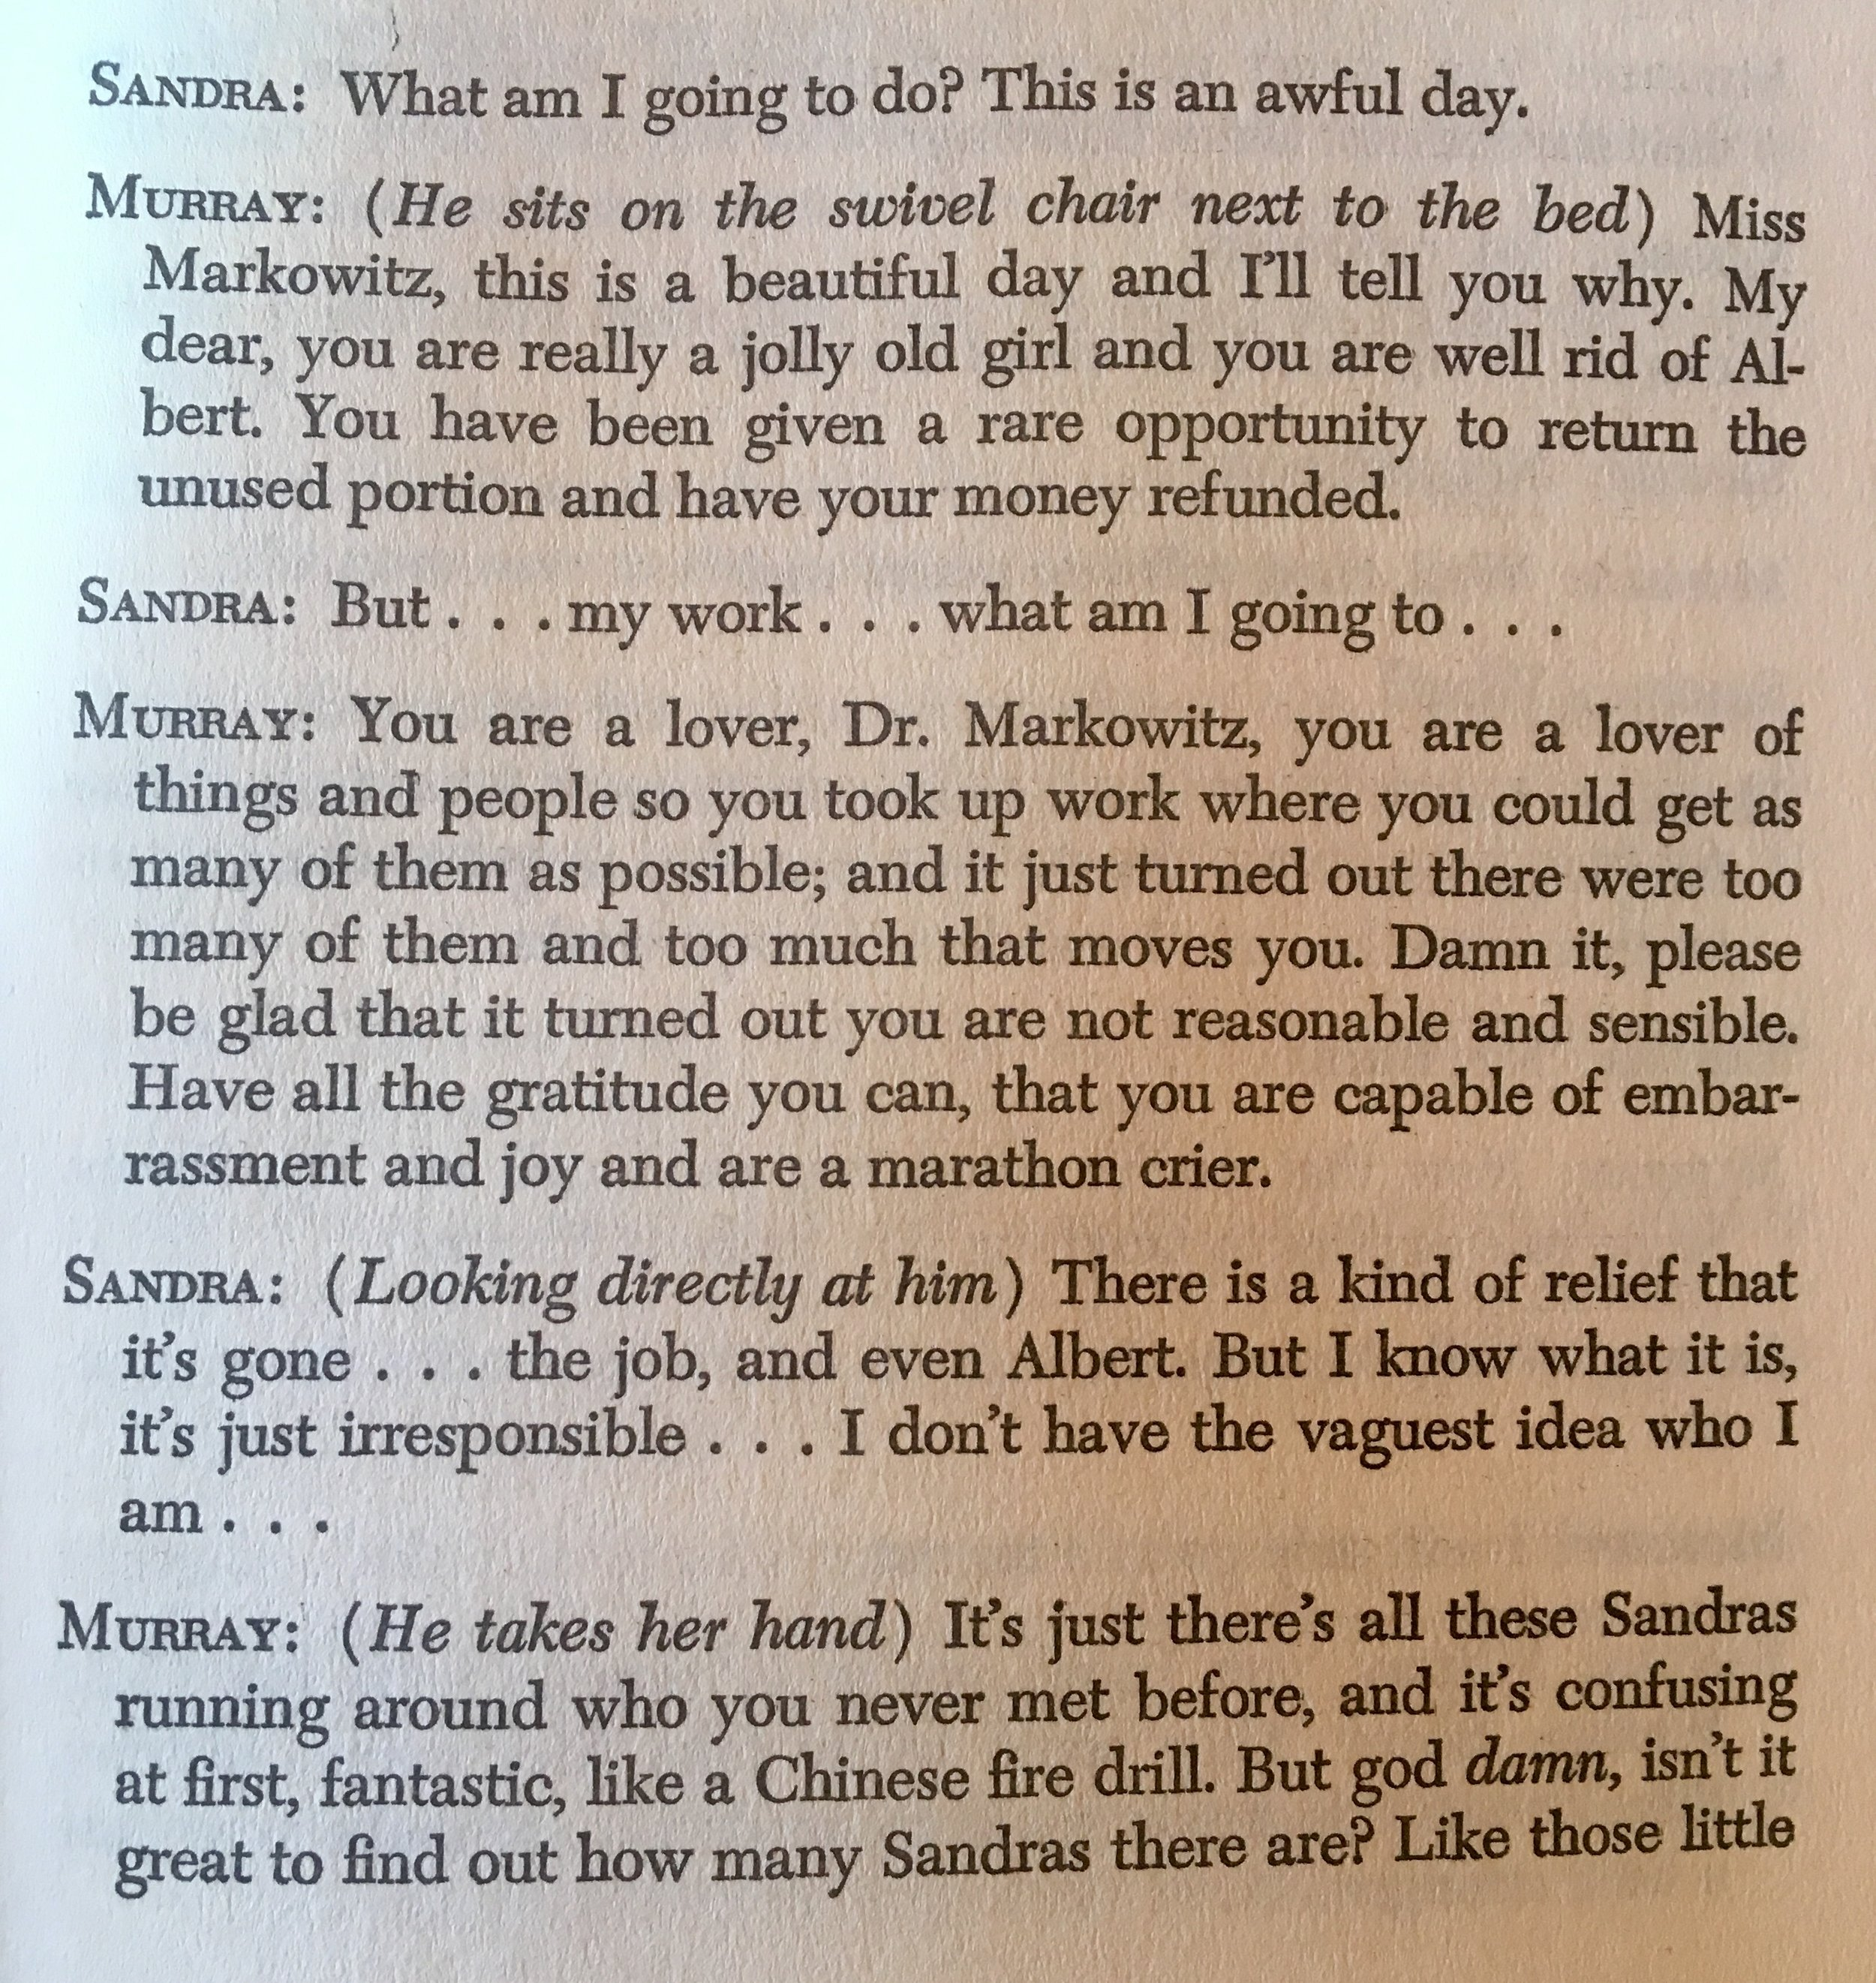 Excerpt from Herb Gardner's play–A Thousand Clowns